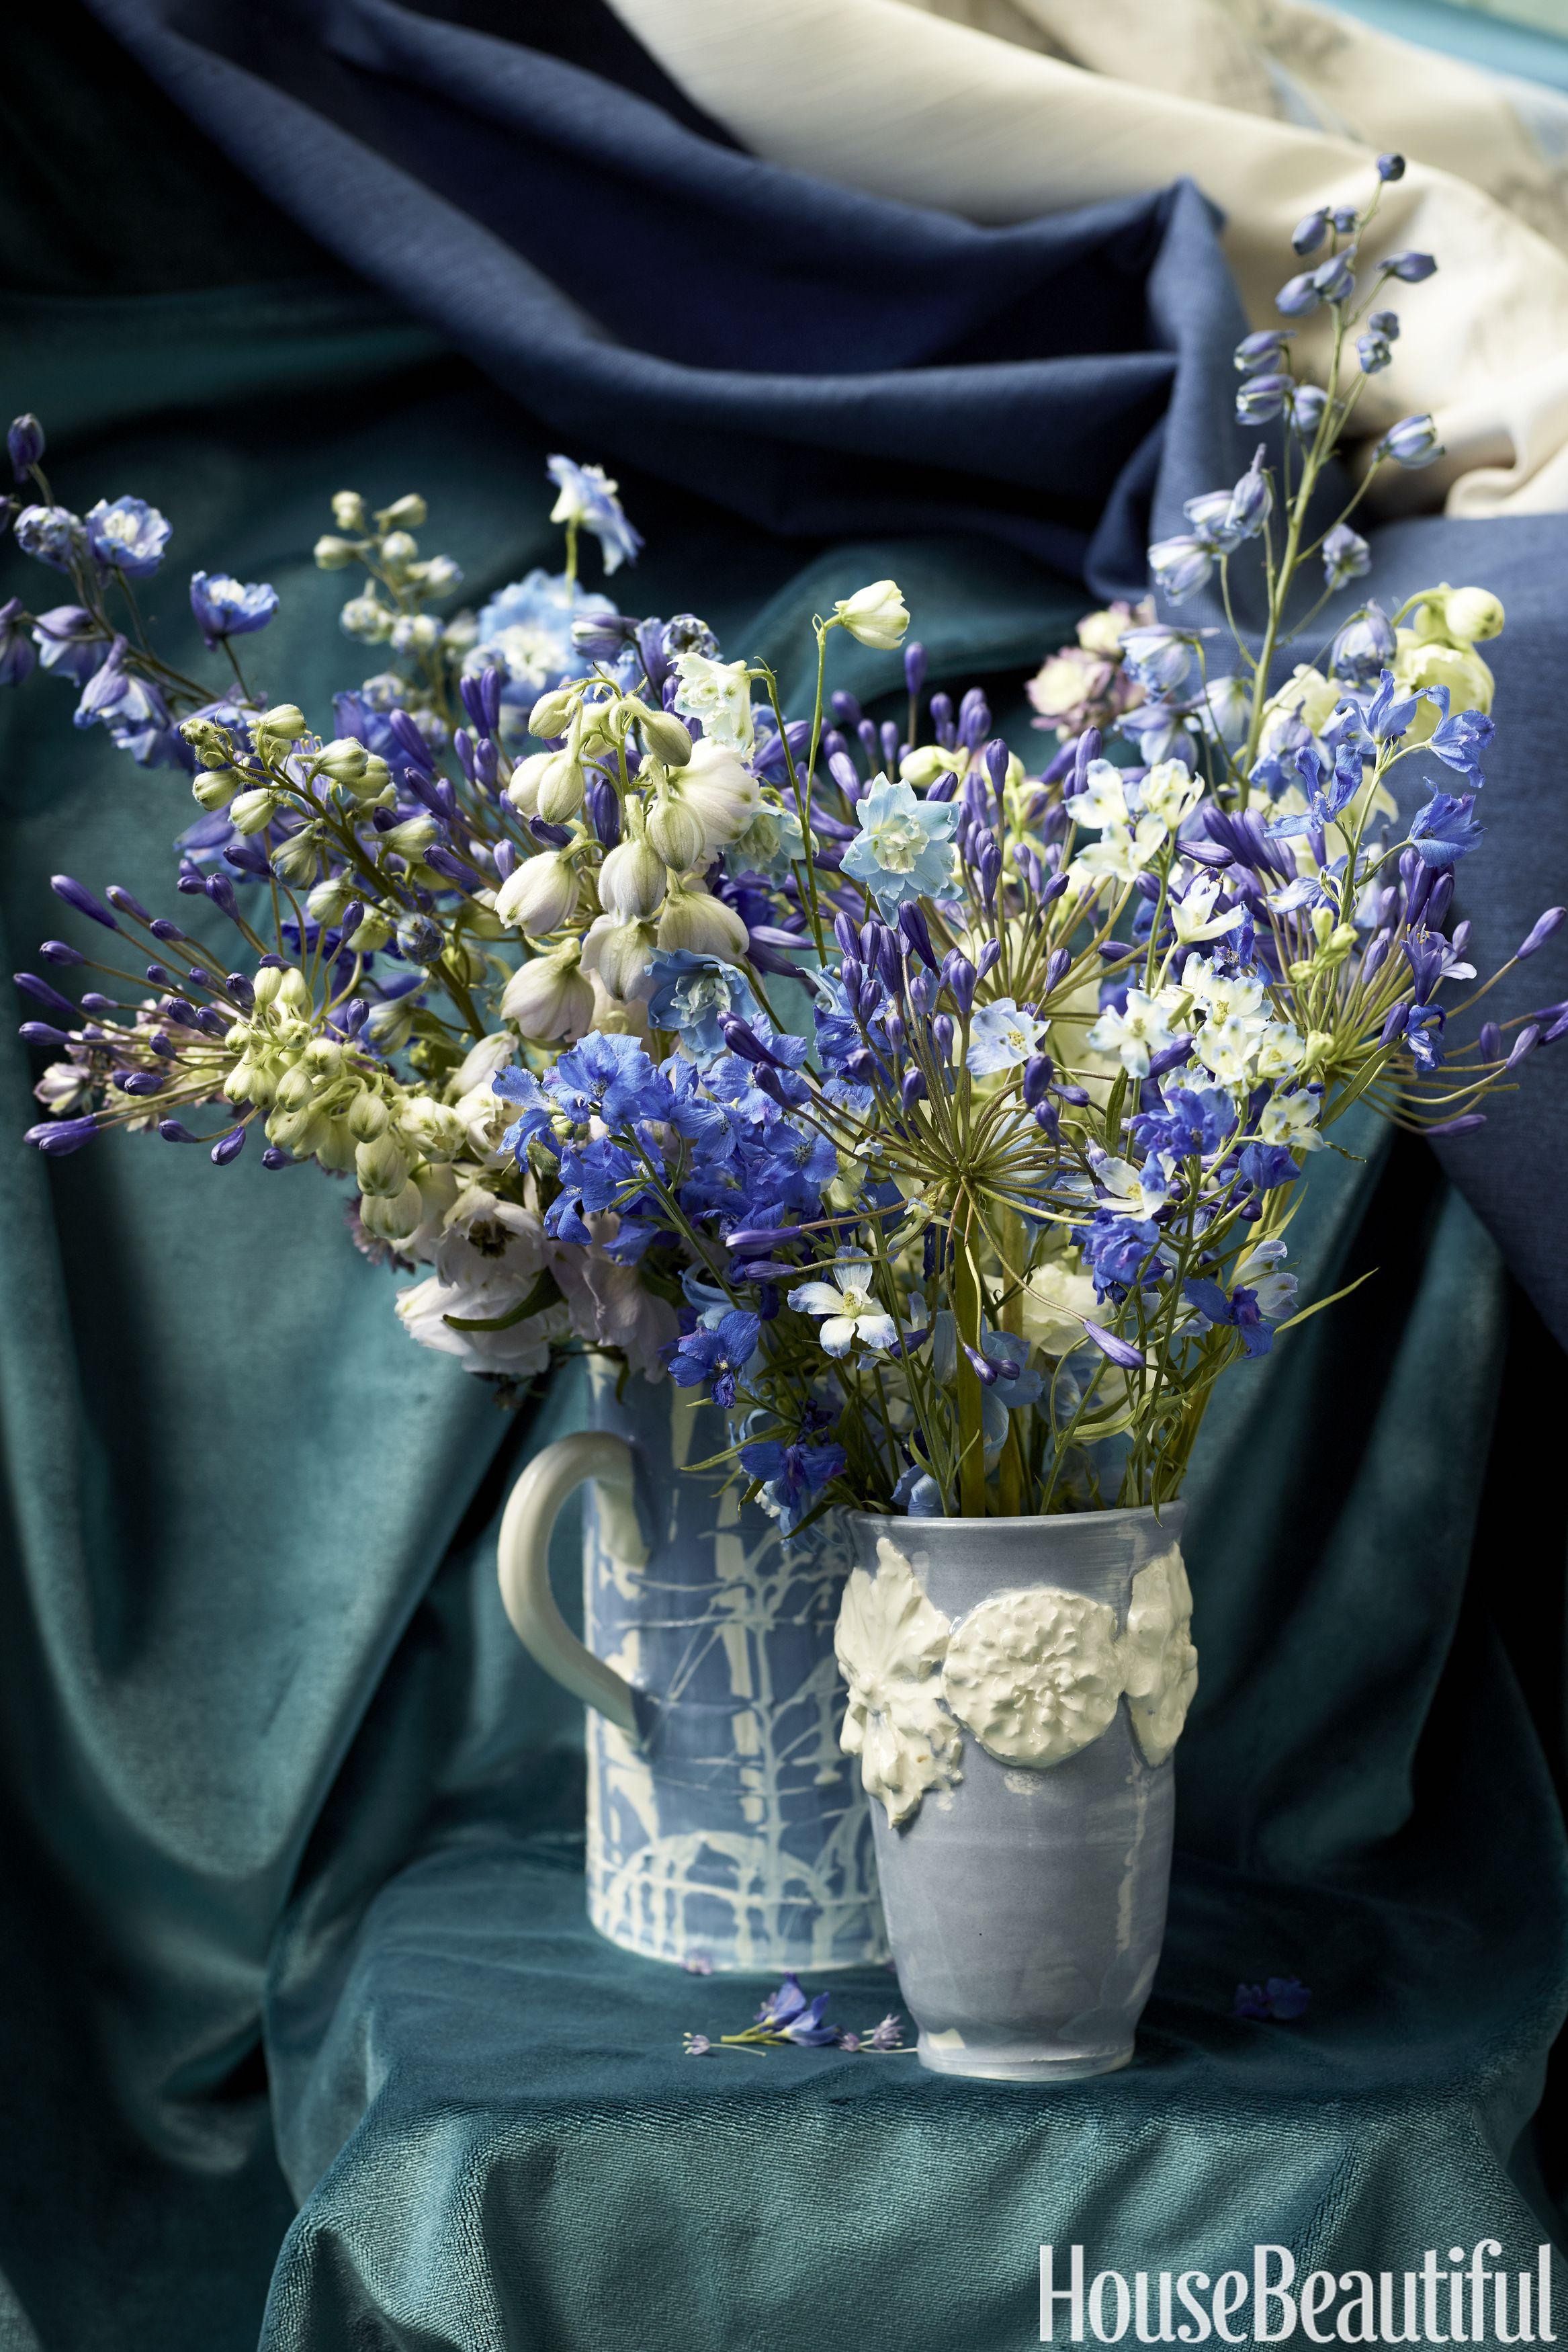 House Beautiful & 55 Easy Flower Arrangement Decoration Ideas \u0026 Pictures - How ...